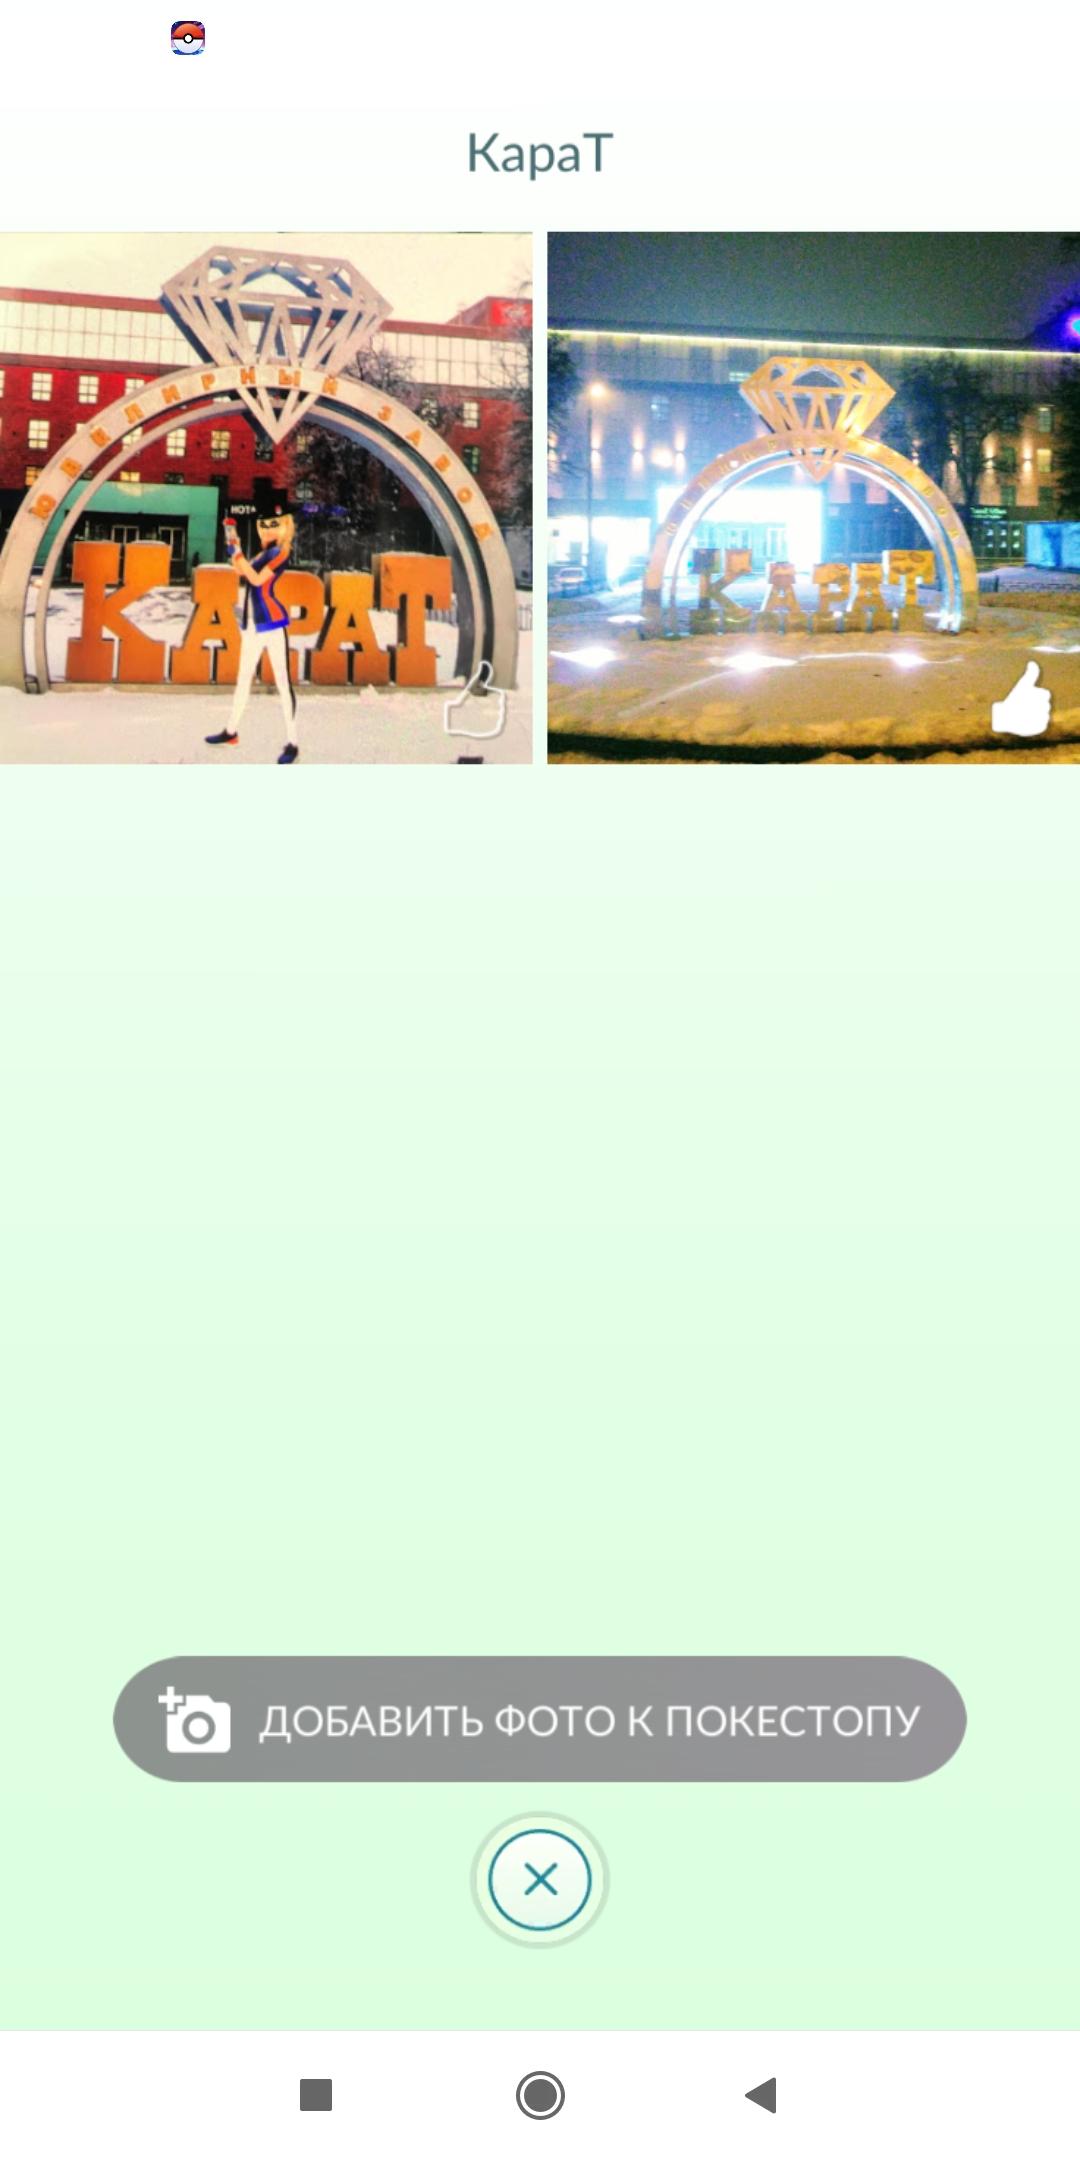 Screenshot_2021-06-02-08-20-10-995_com.nianticlabs.pokemongo.jpg